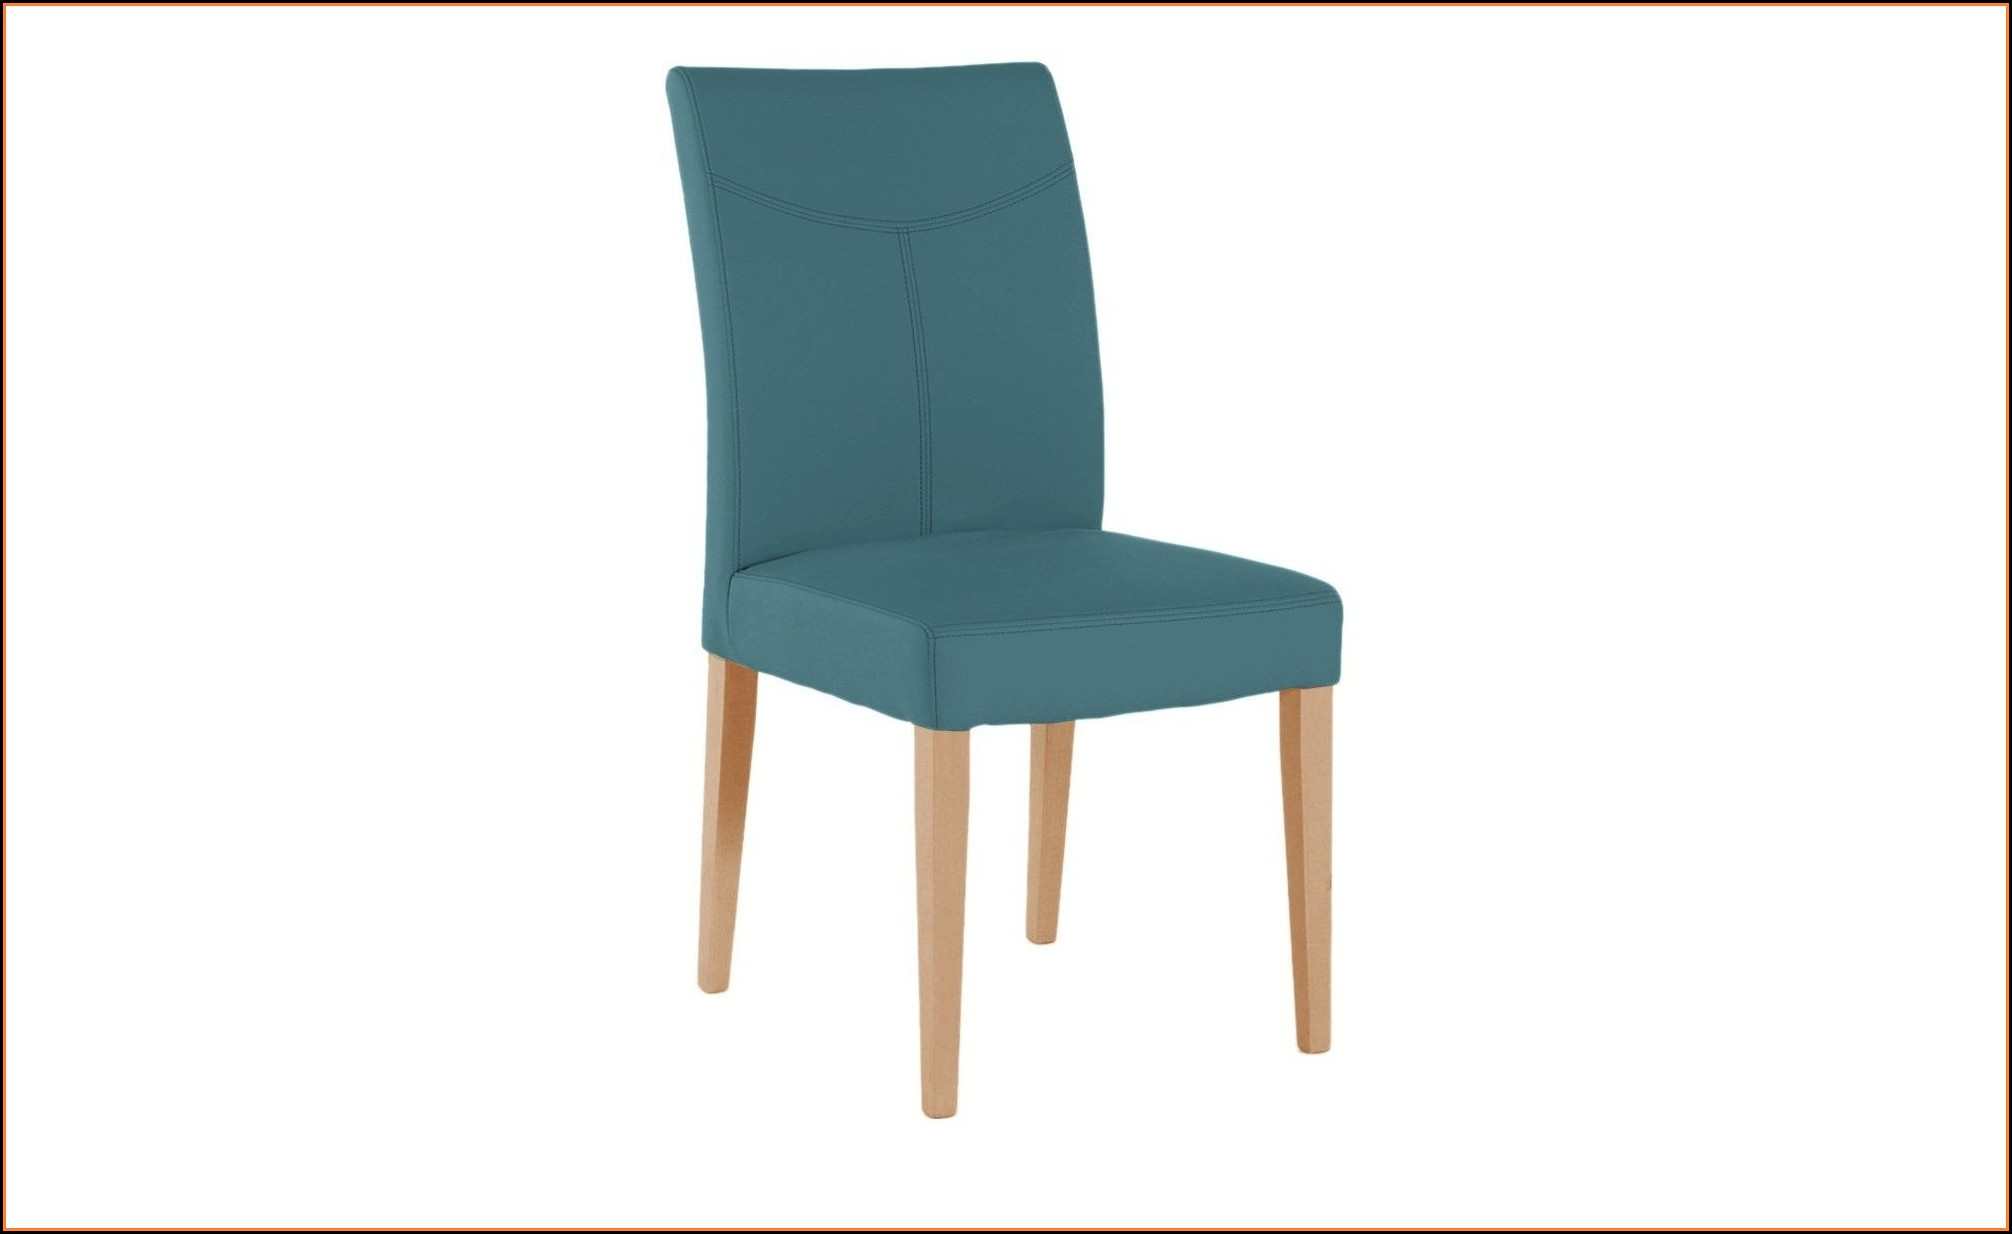 Ikea Esszimmer Stuhl